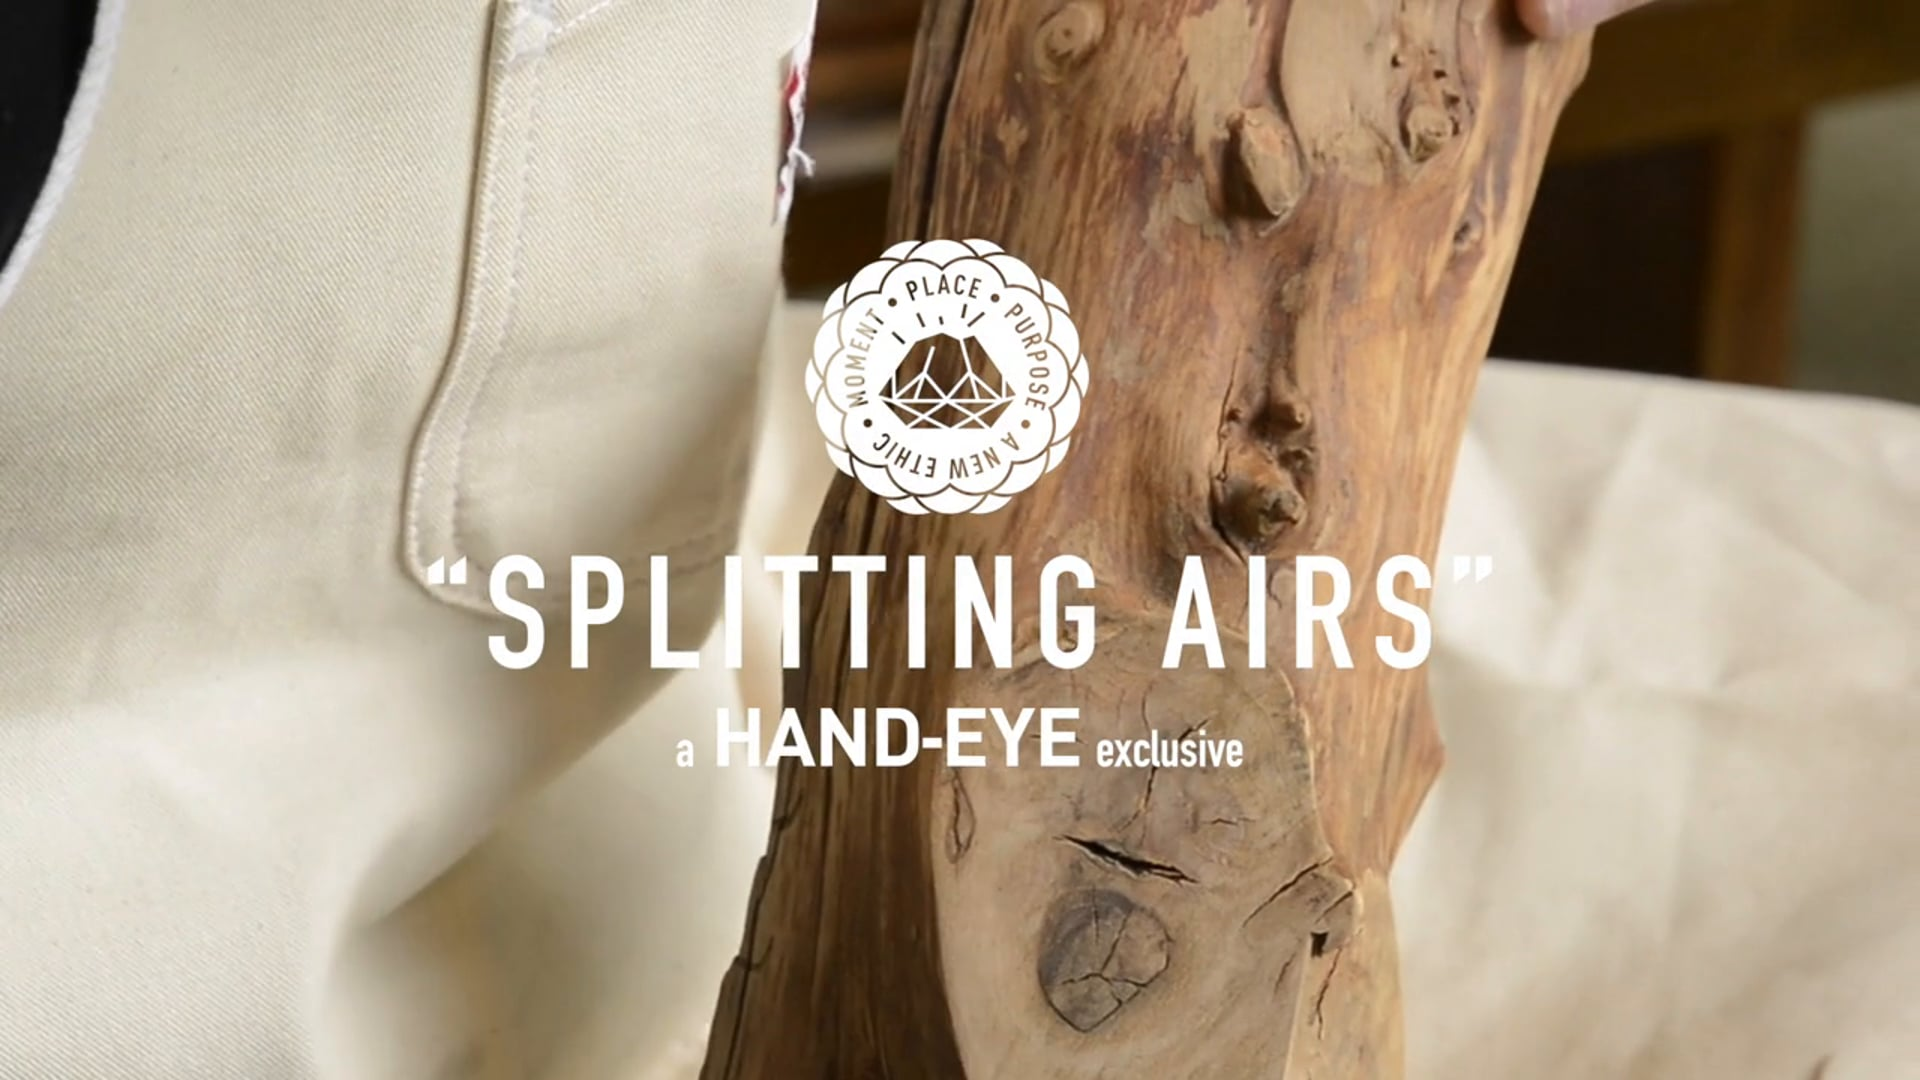 Splitting Airs